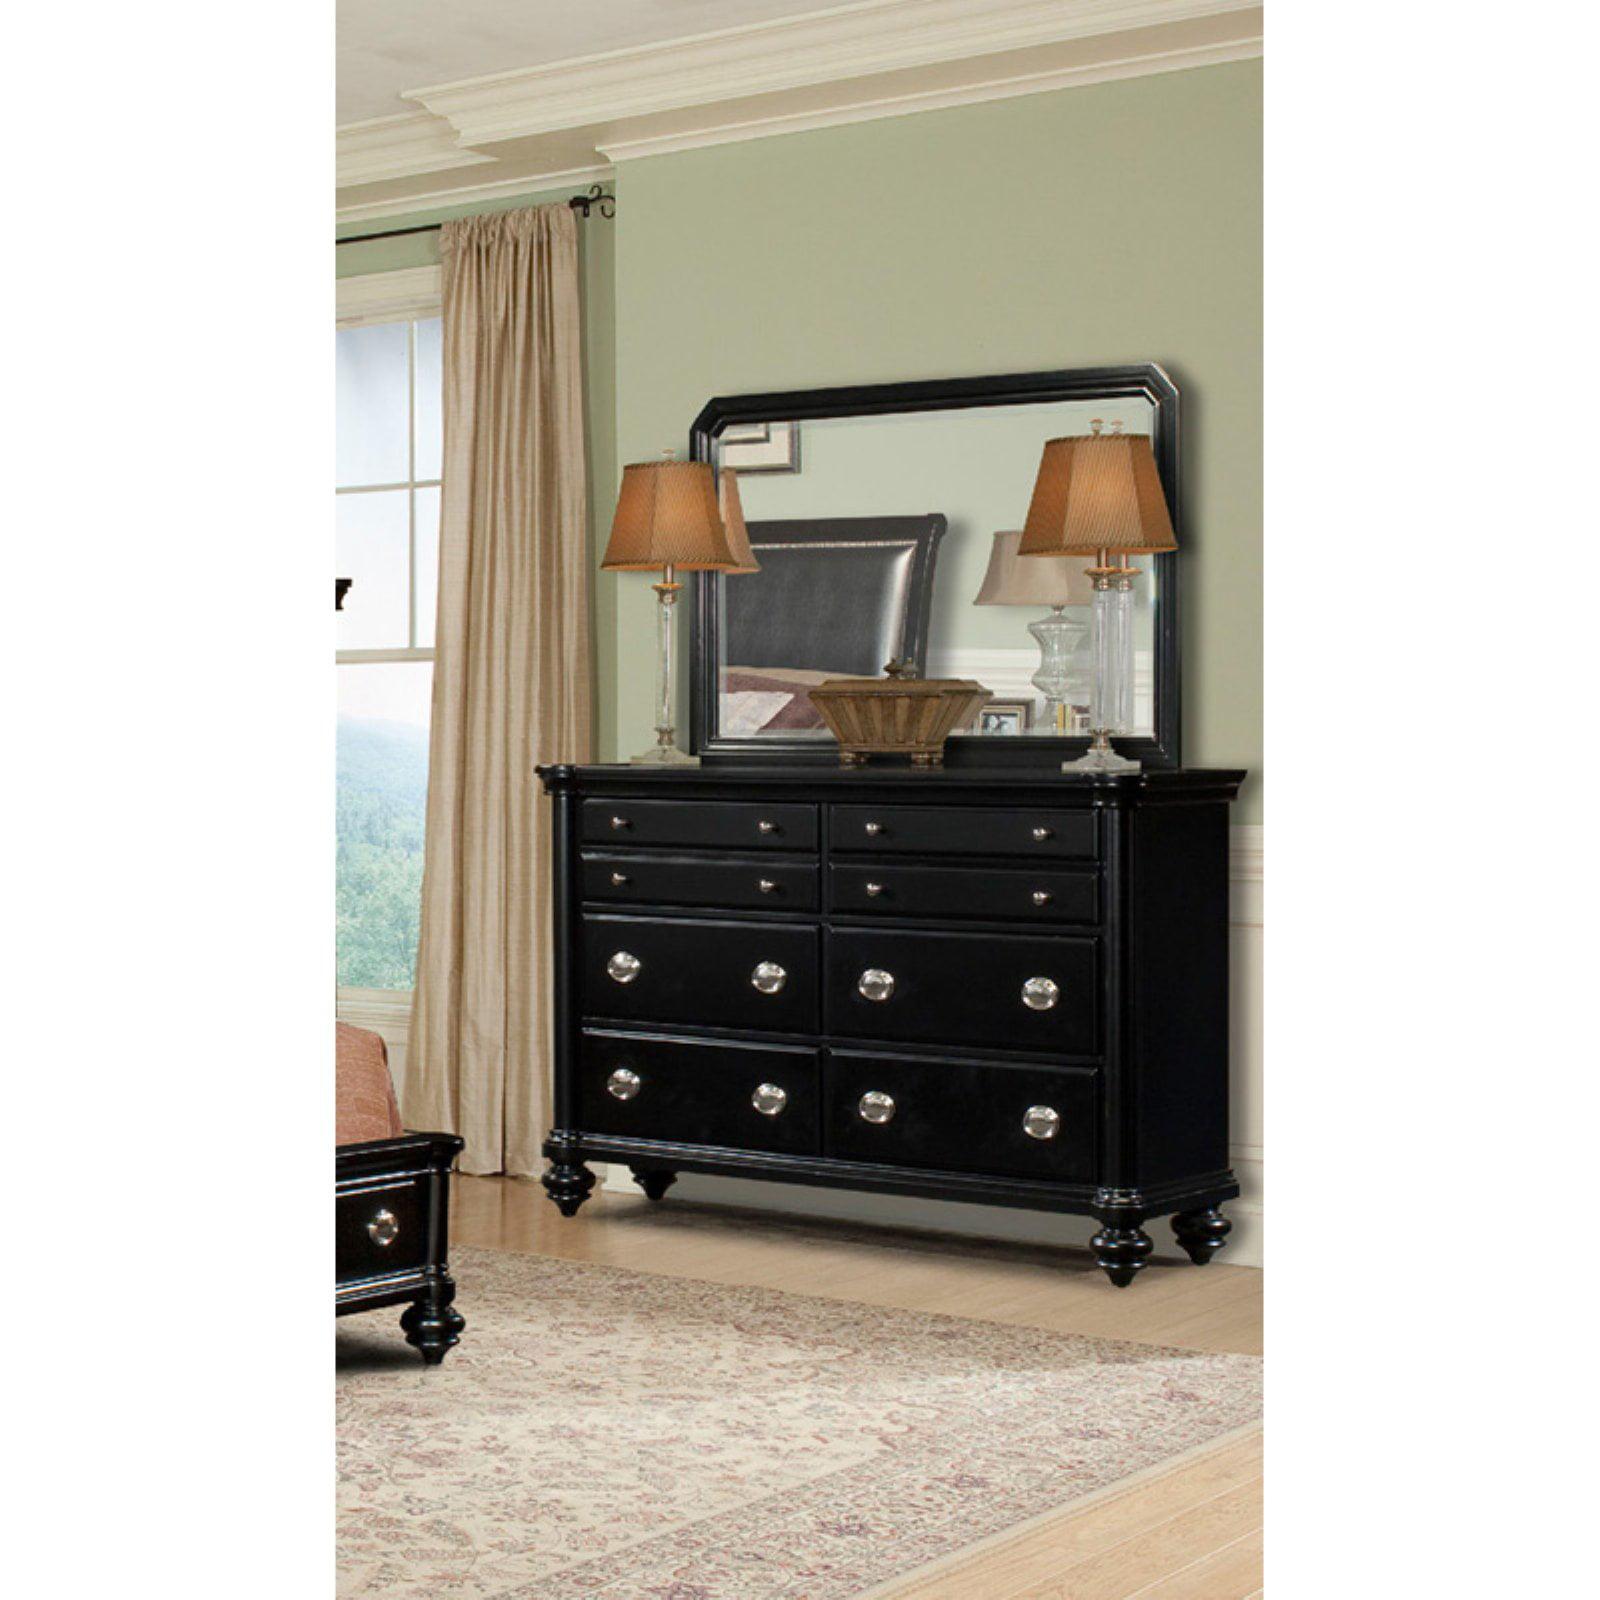 Klaussner Danbury 6 Drawer Dresser with Optional Mirror